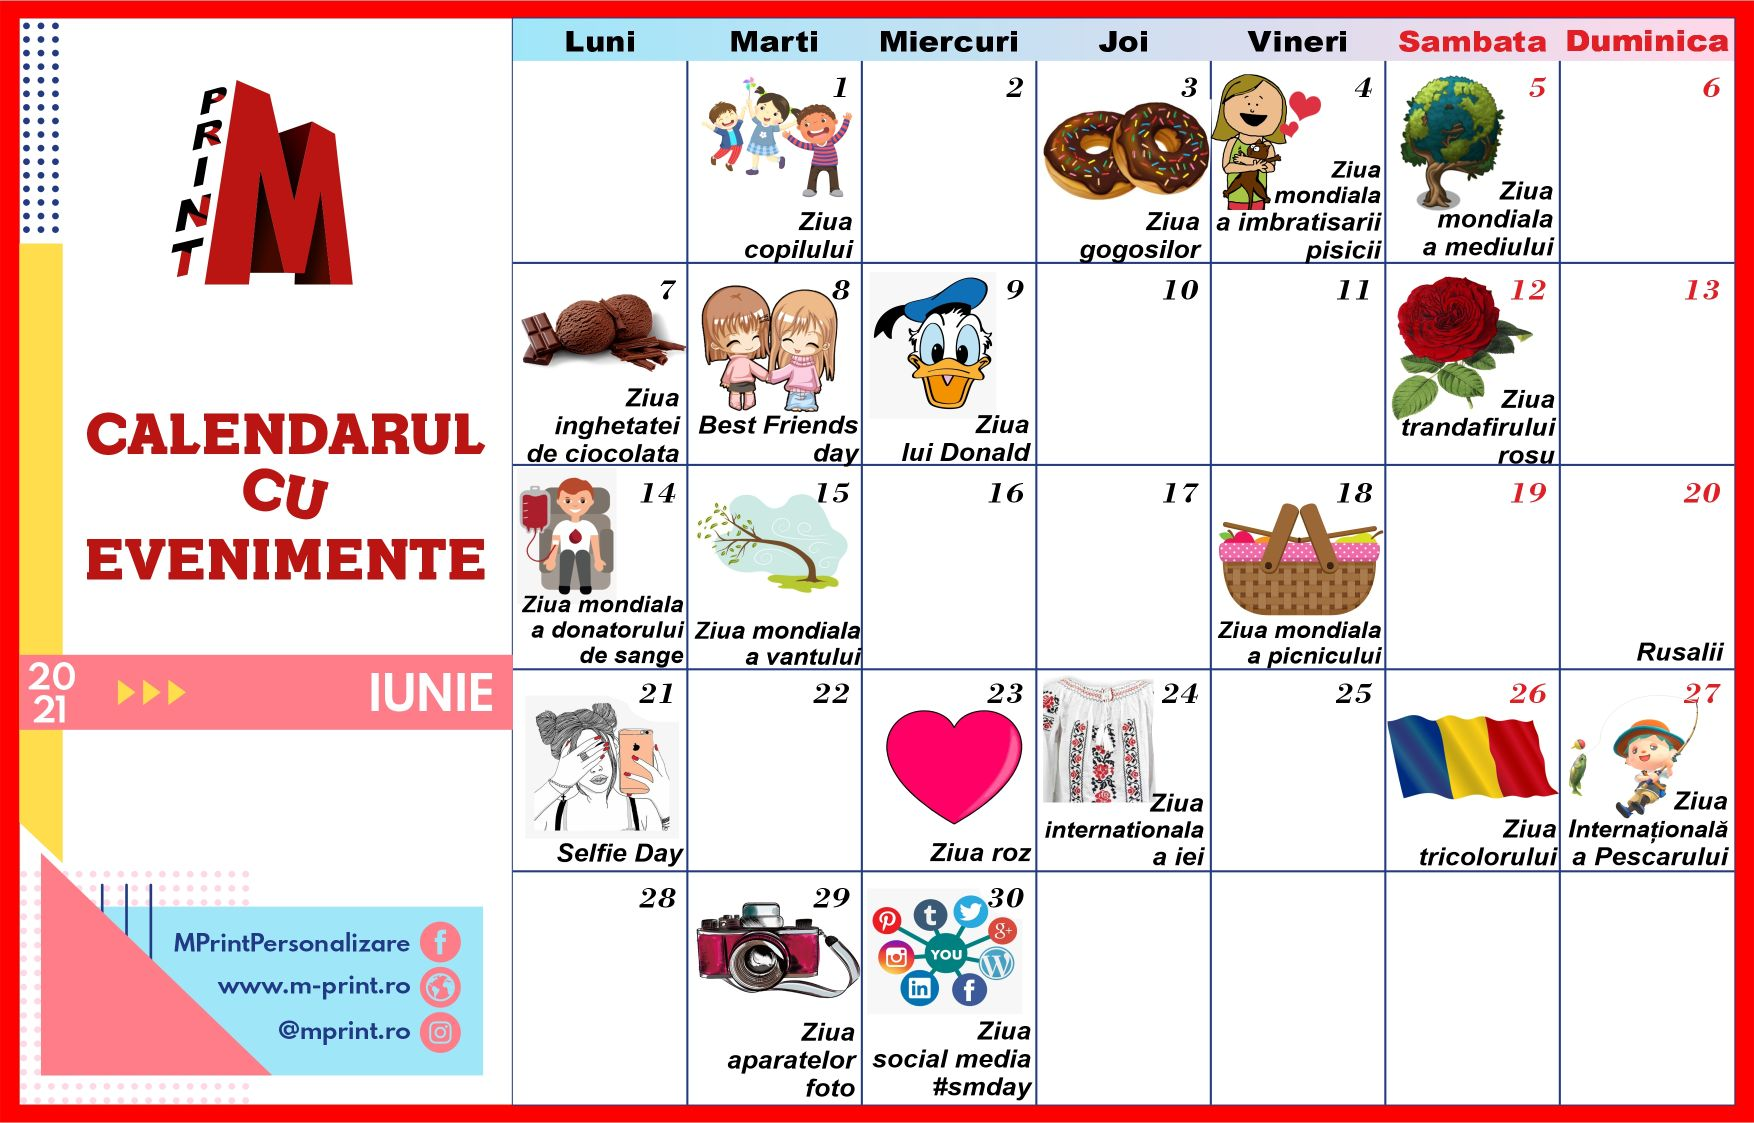 Calendarul cu Evenimente - Iunie 2021